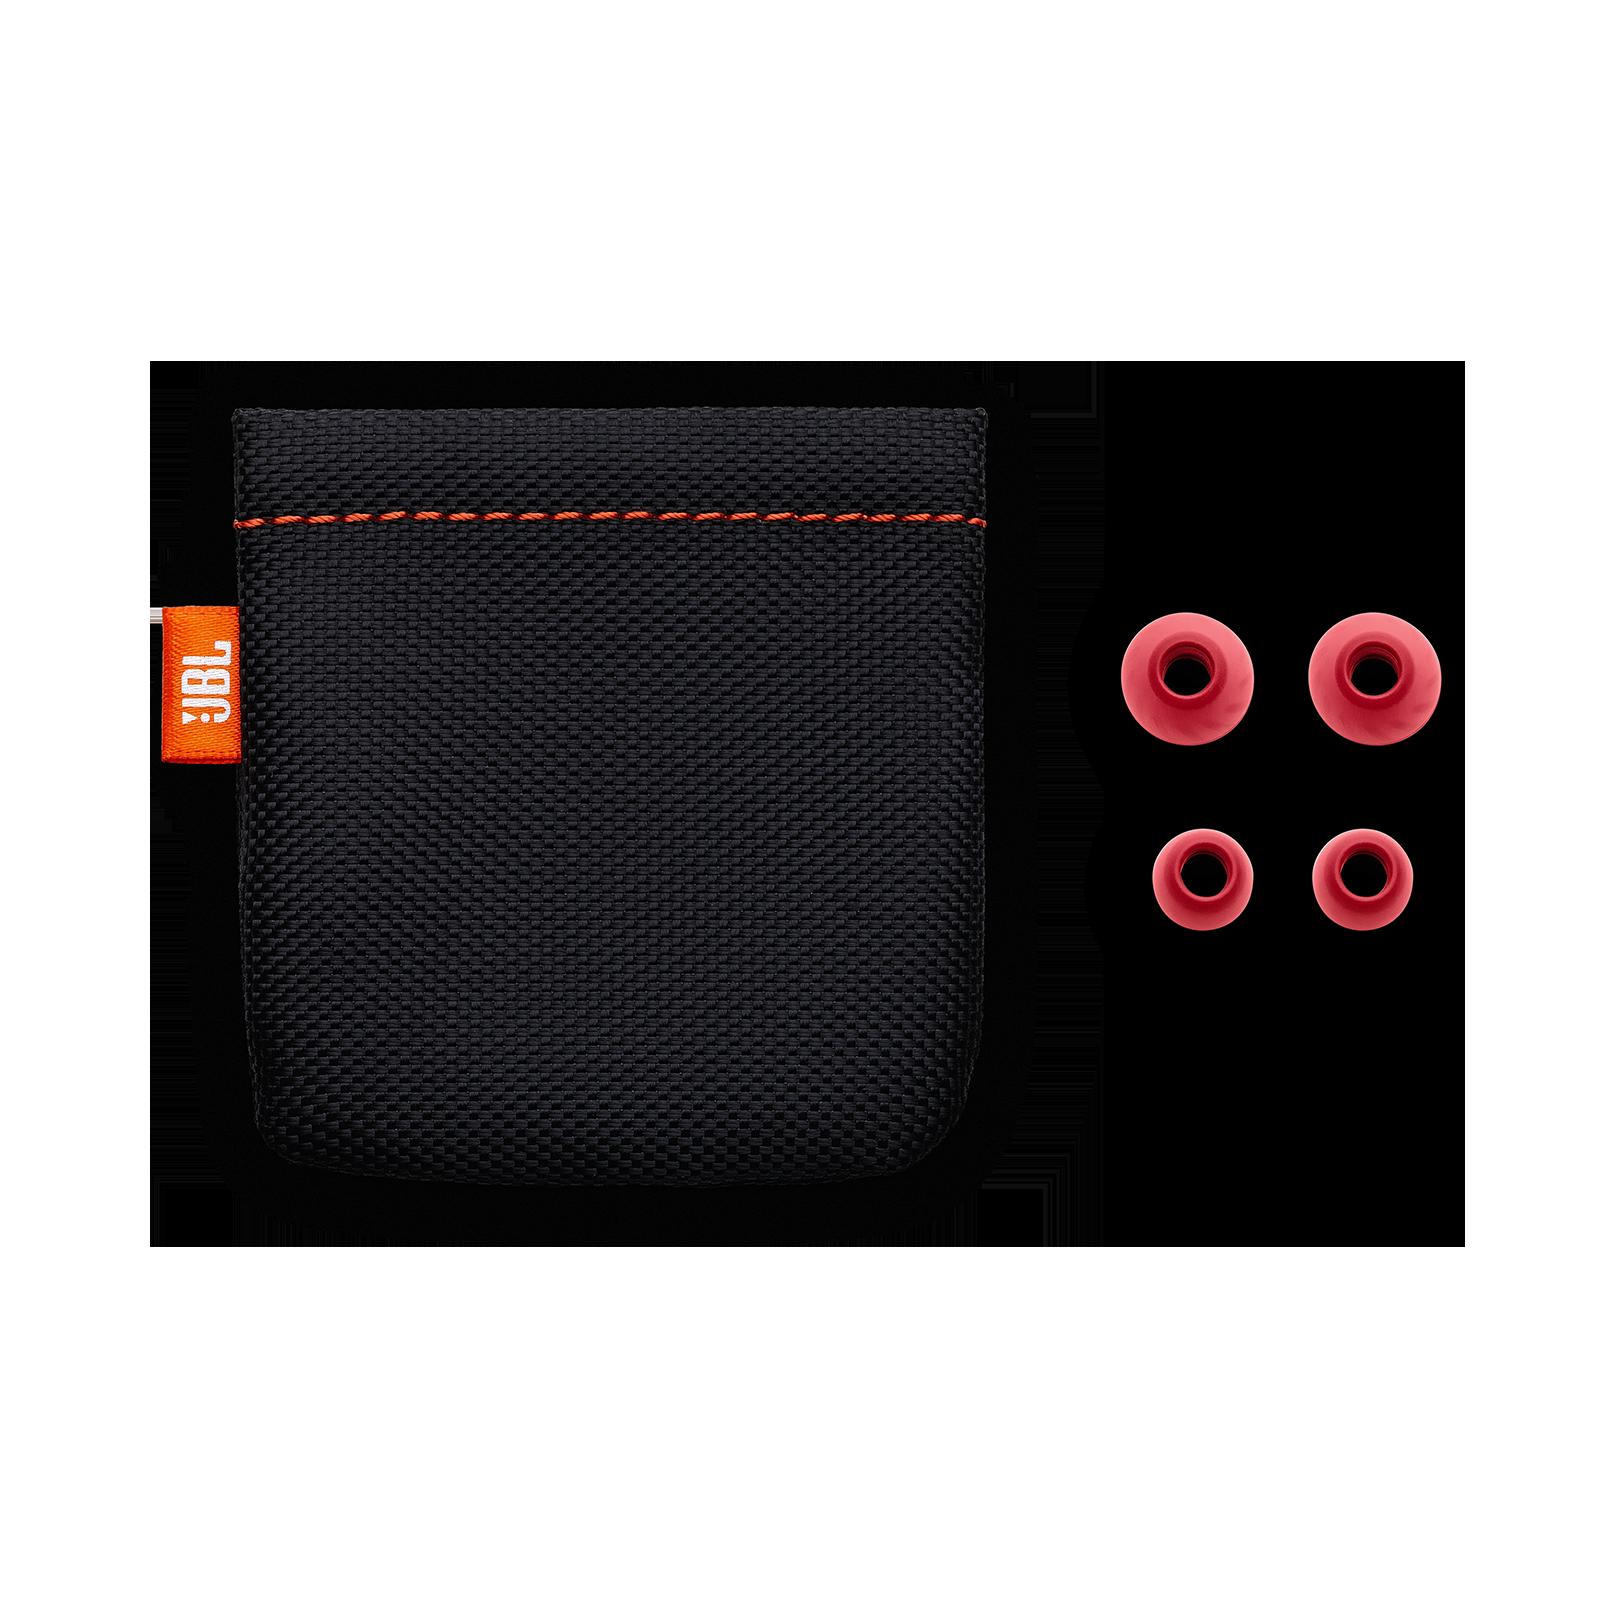 JBL LIVE 100 - Red - In-ear headphones - Detailshot 3